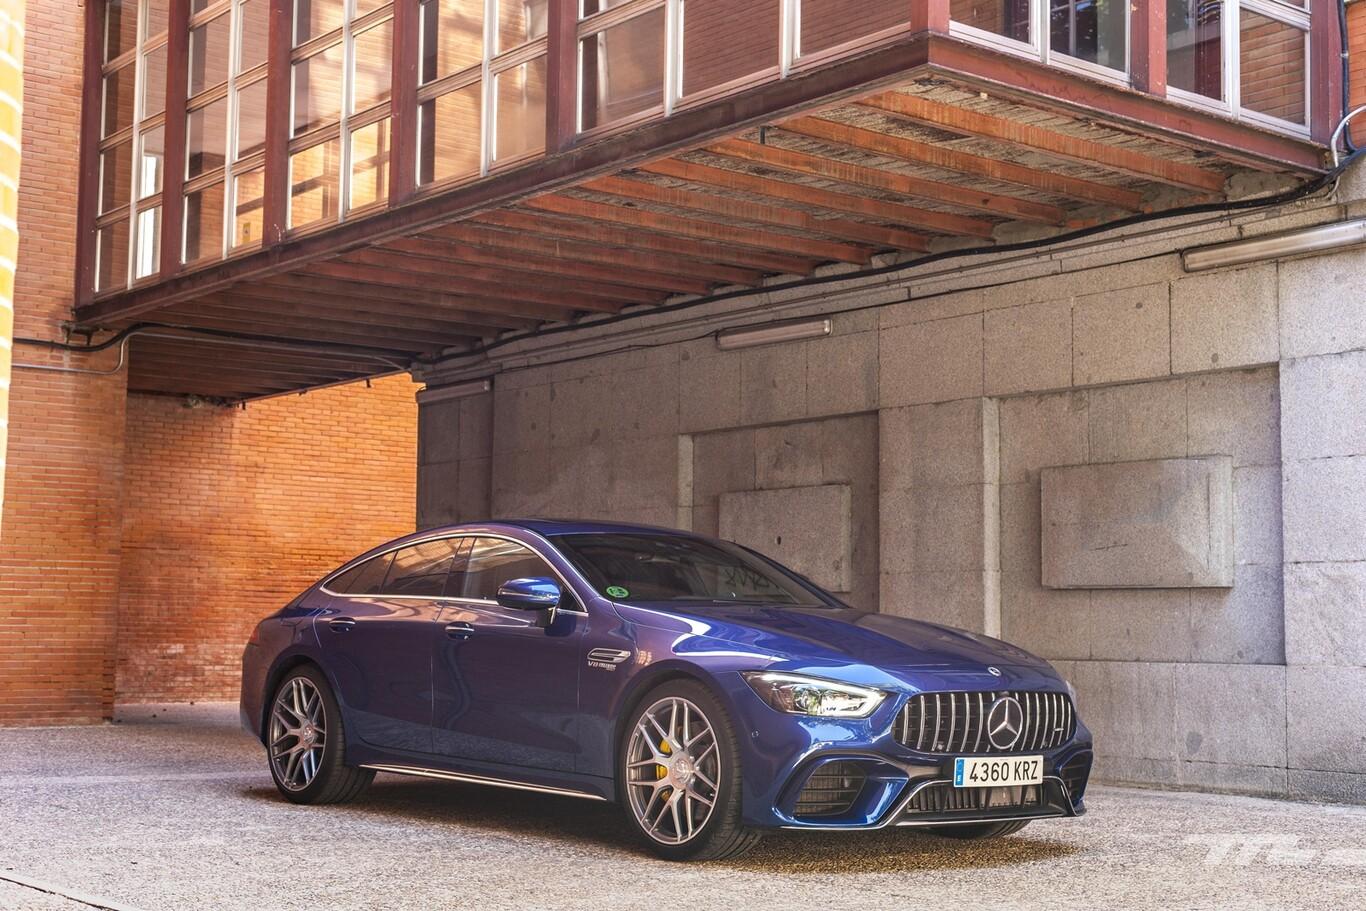 Ecco svelata la nuova Mercedes AMG GT